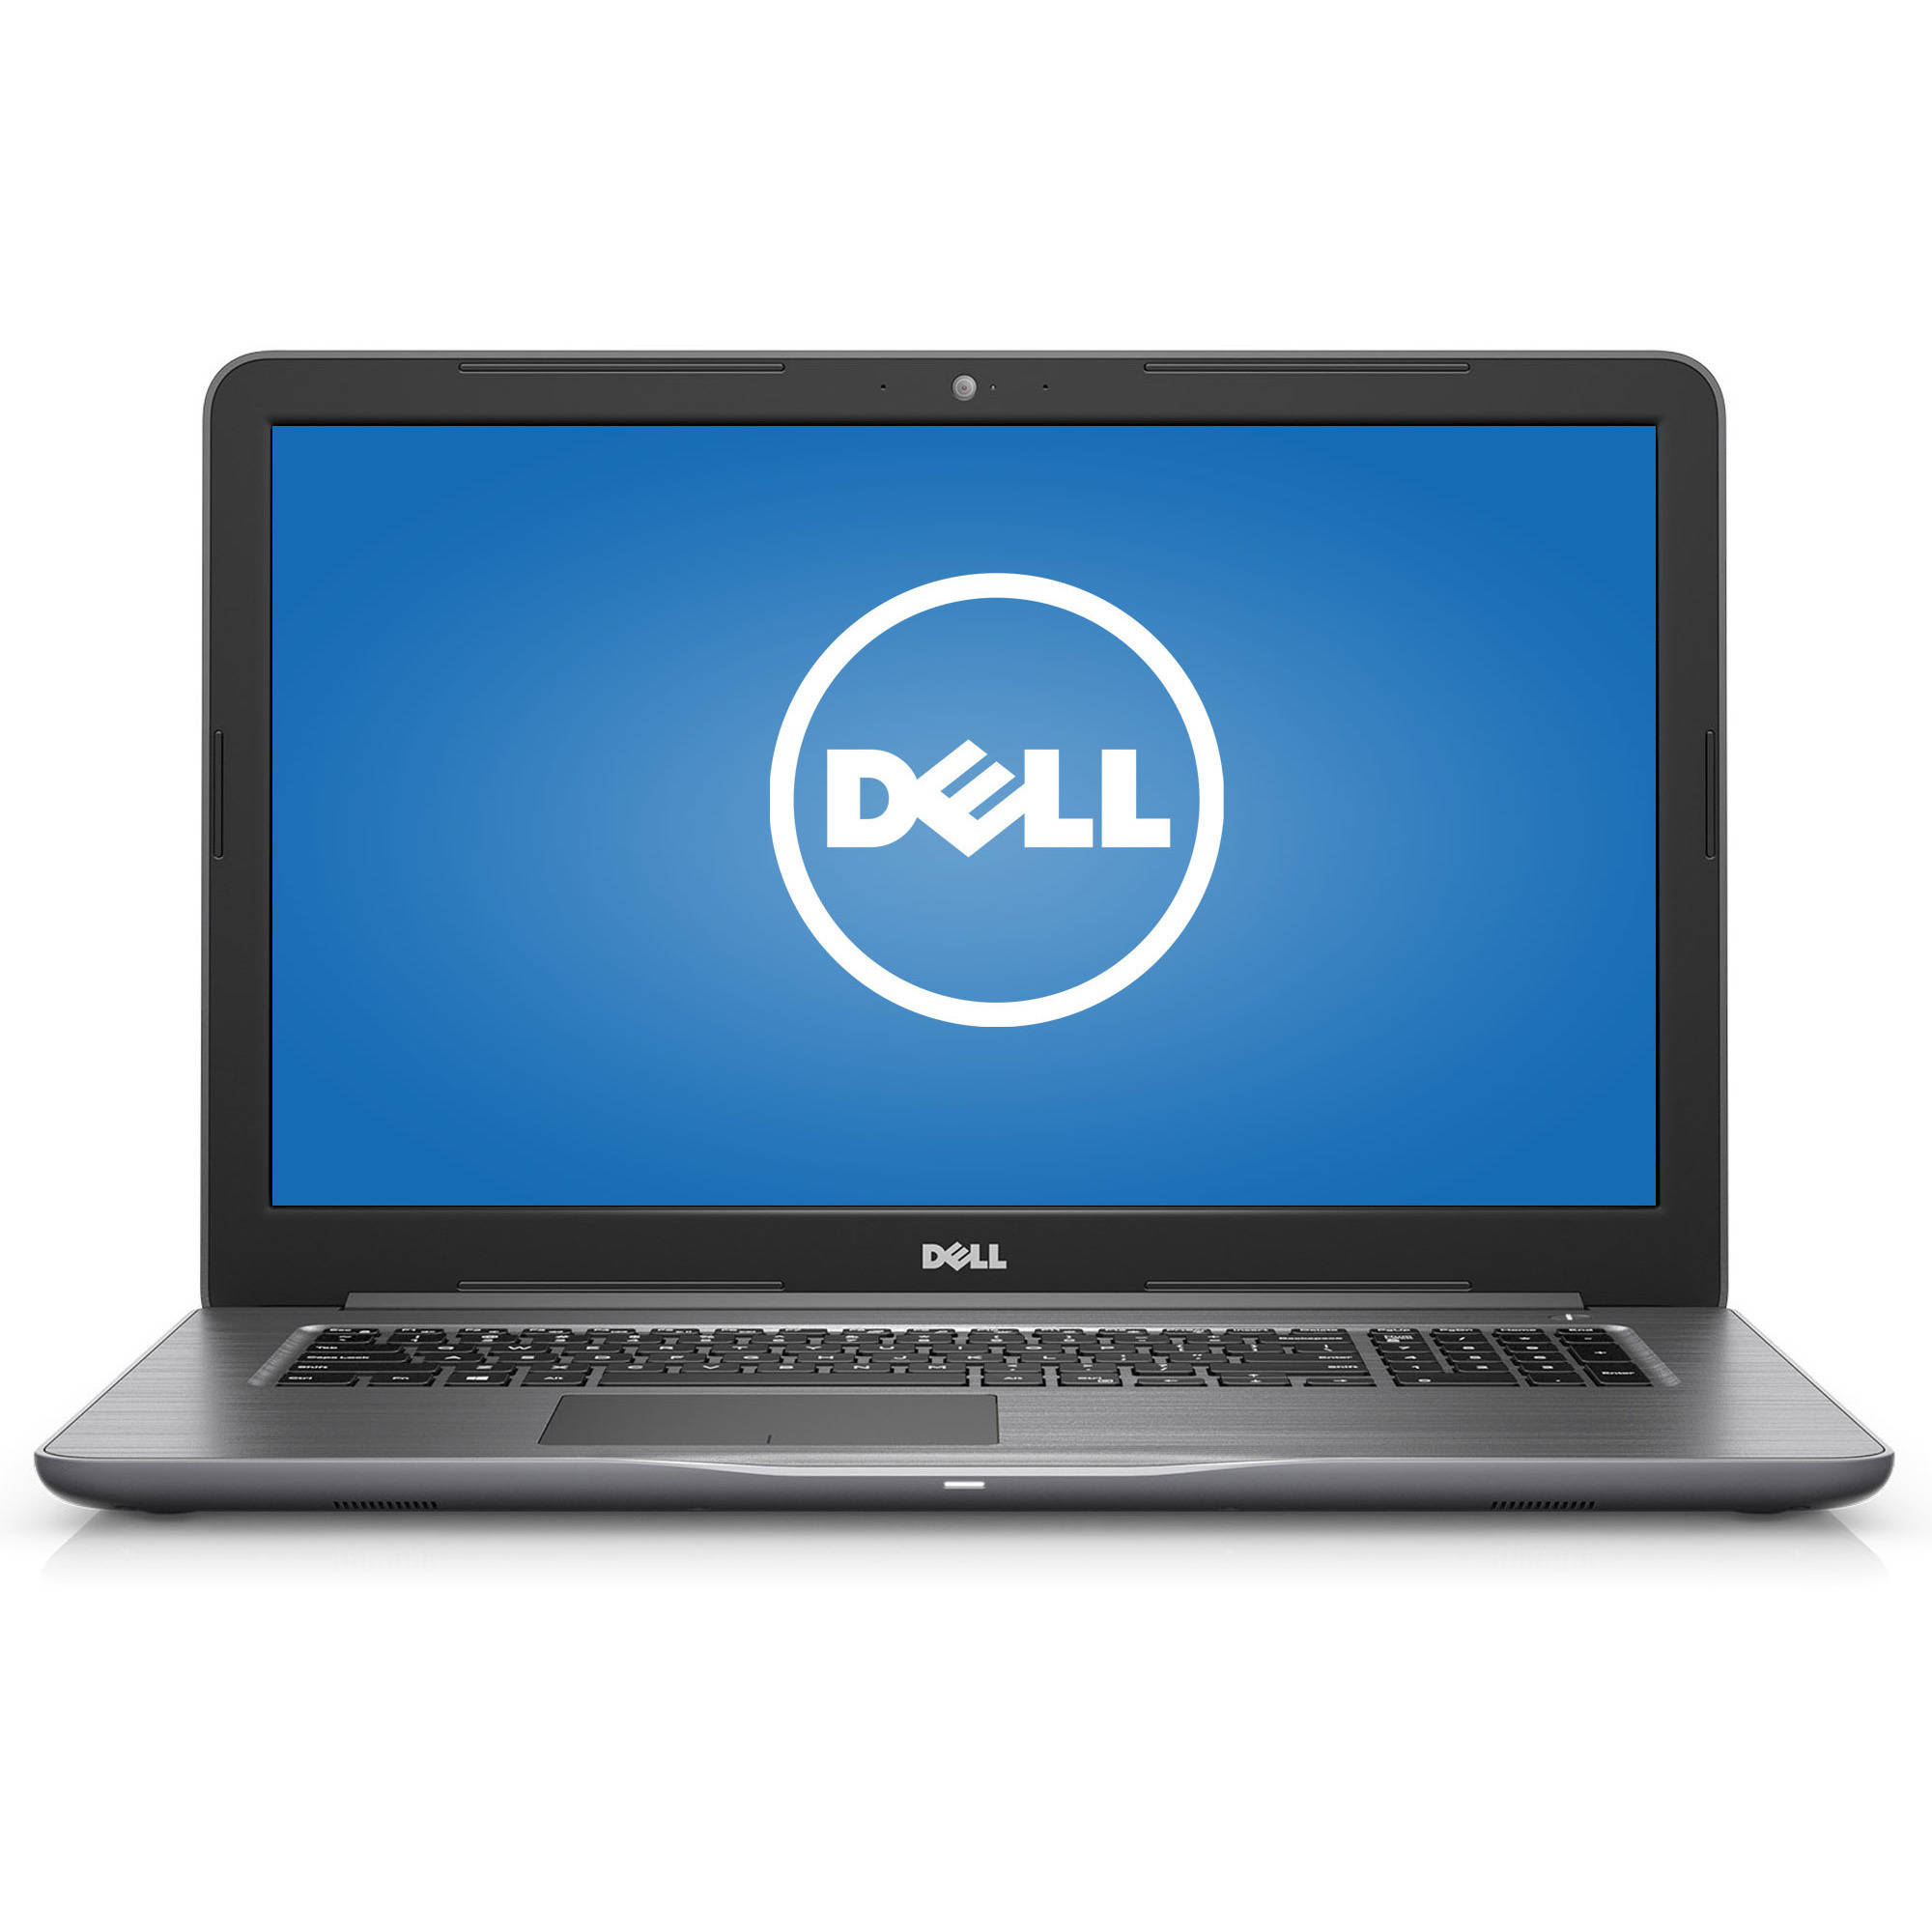 Dell Laptop Service Center Rajajinagar Bangalore